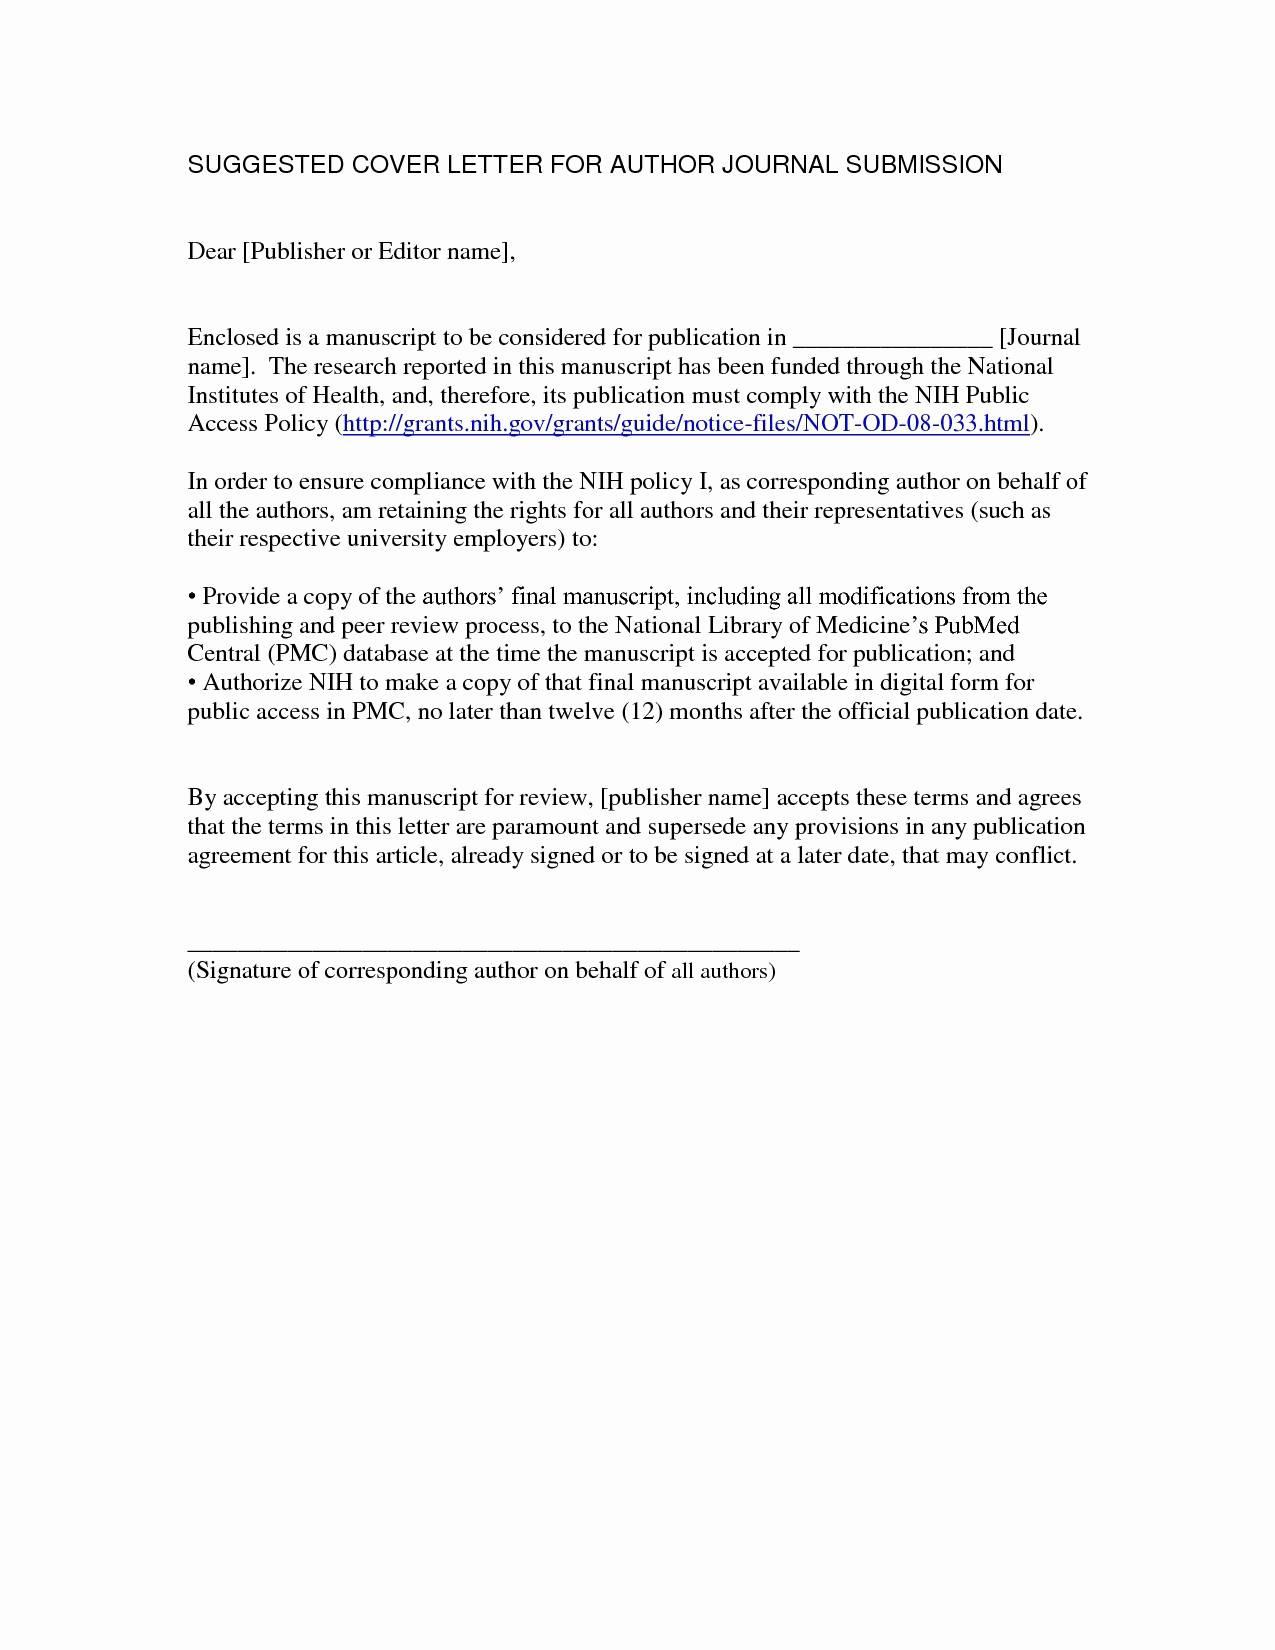 Business Proposal Acceptance Letter Template - Home Fer Letter Template Inspirational Business Letter format